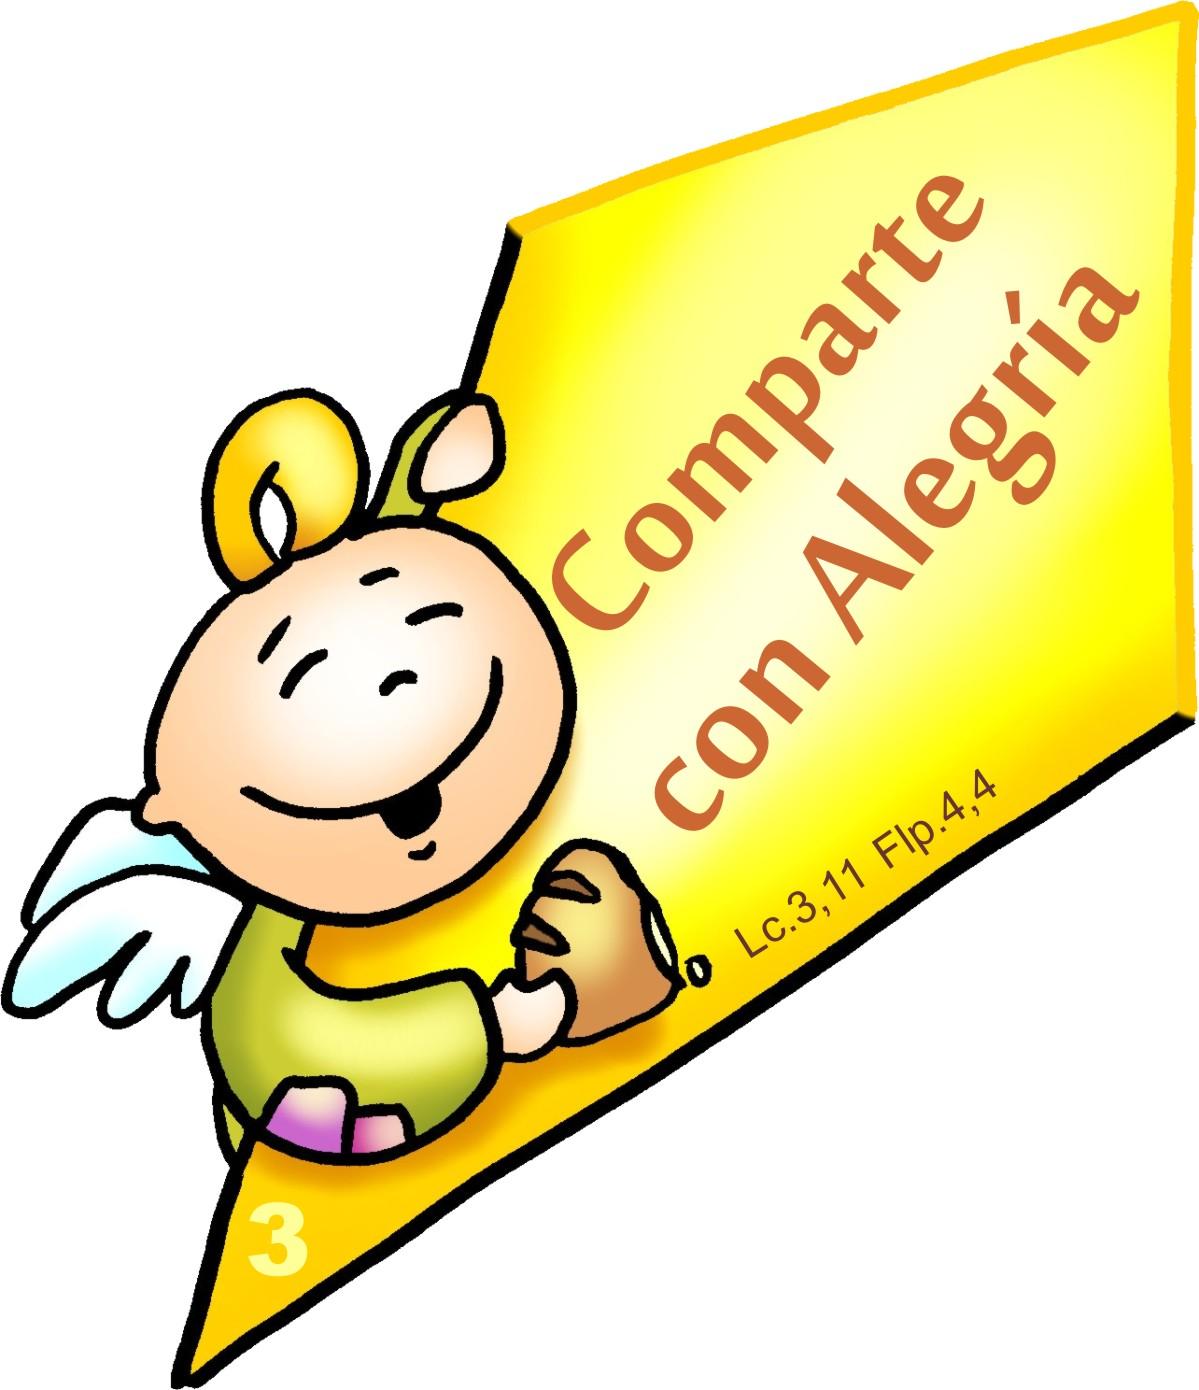 https://odresnuevos.files.wordpress.com/2015/11/odres-nuevos-3_domingo_de_adviento_coloor_texto.jpg